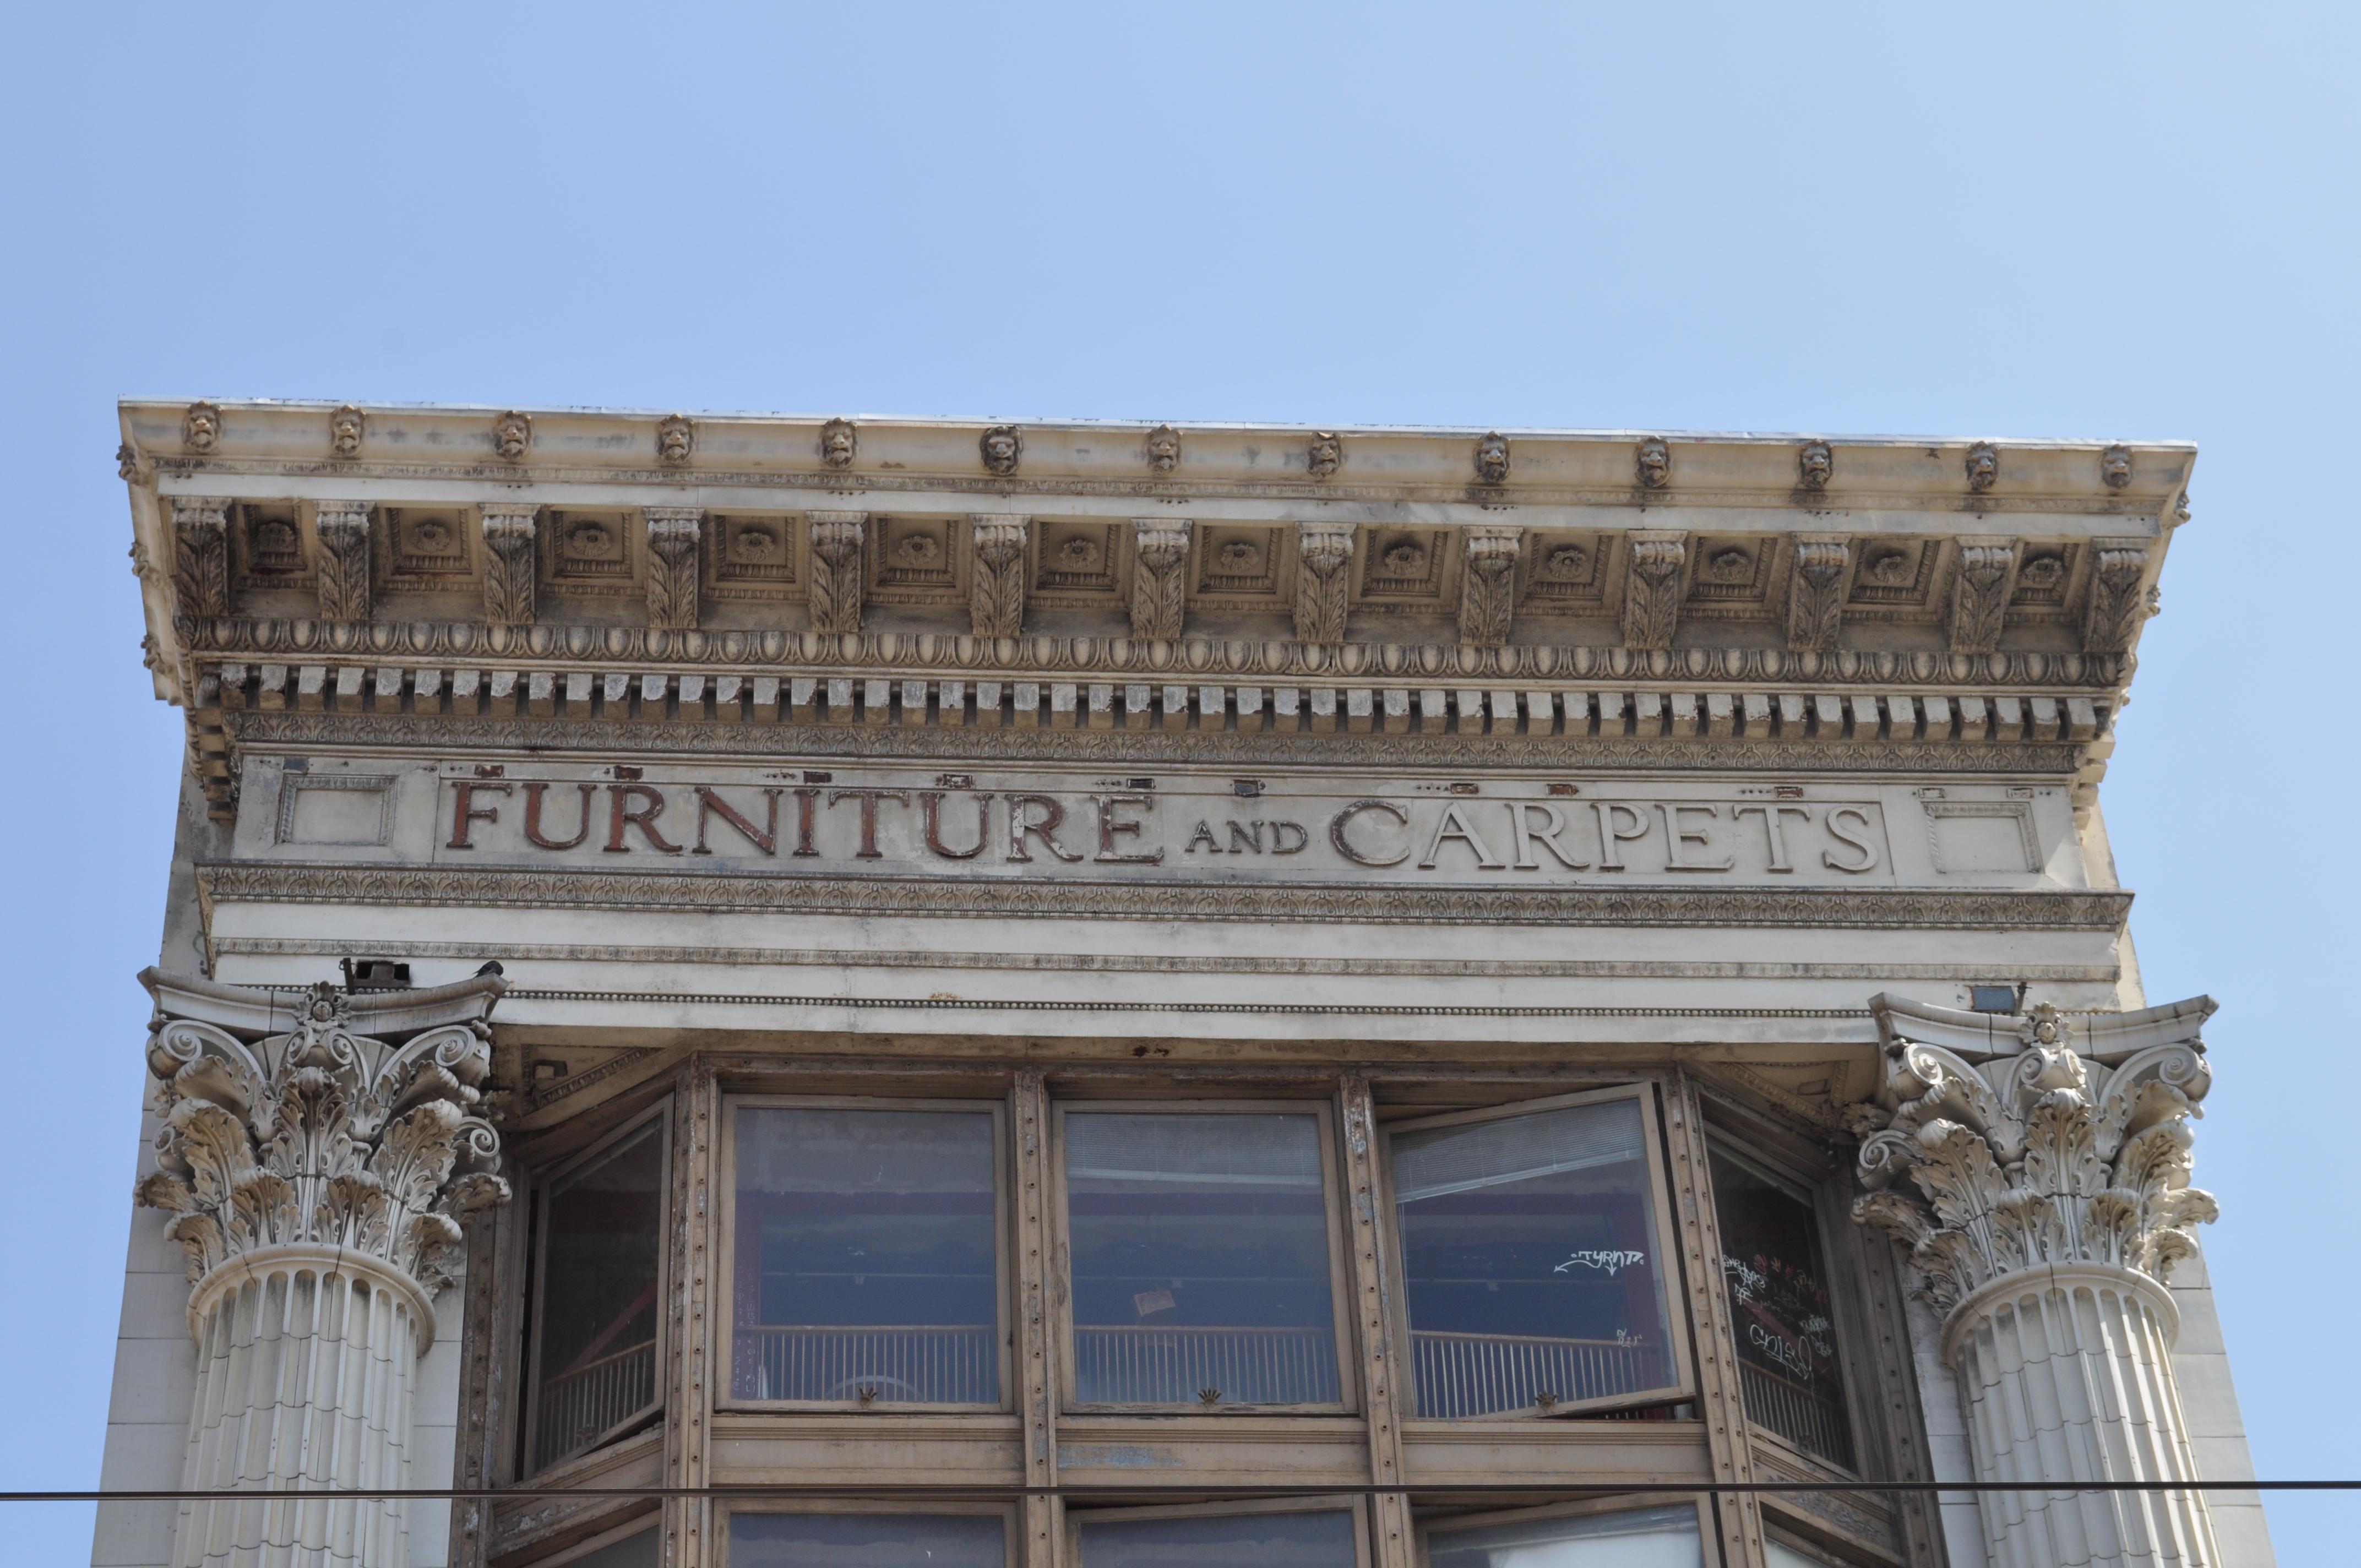 FileSan Francisco Furniture And Carpets Cornicejpg Wikimedia - San francisco furniture